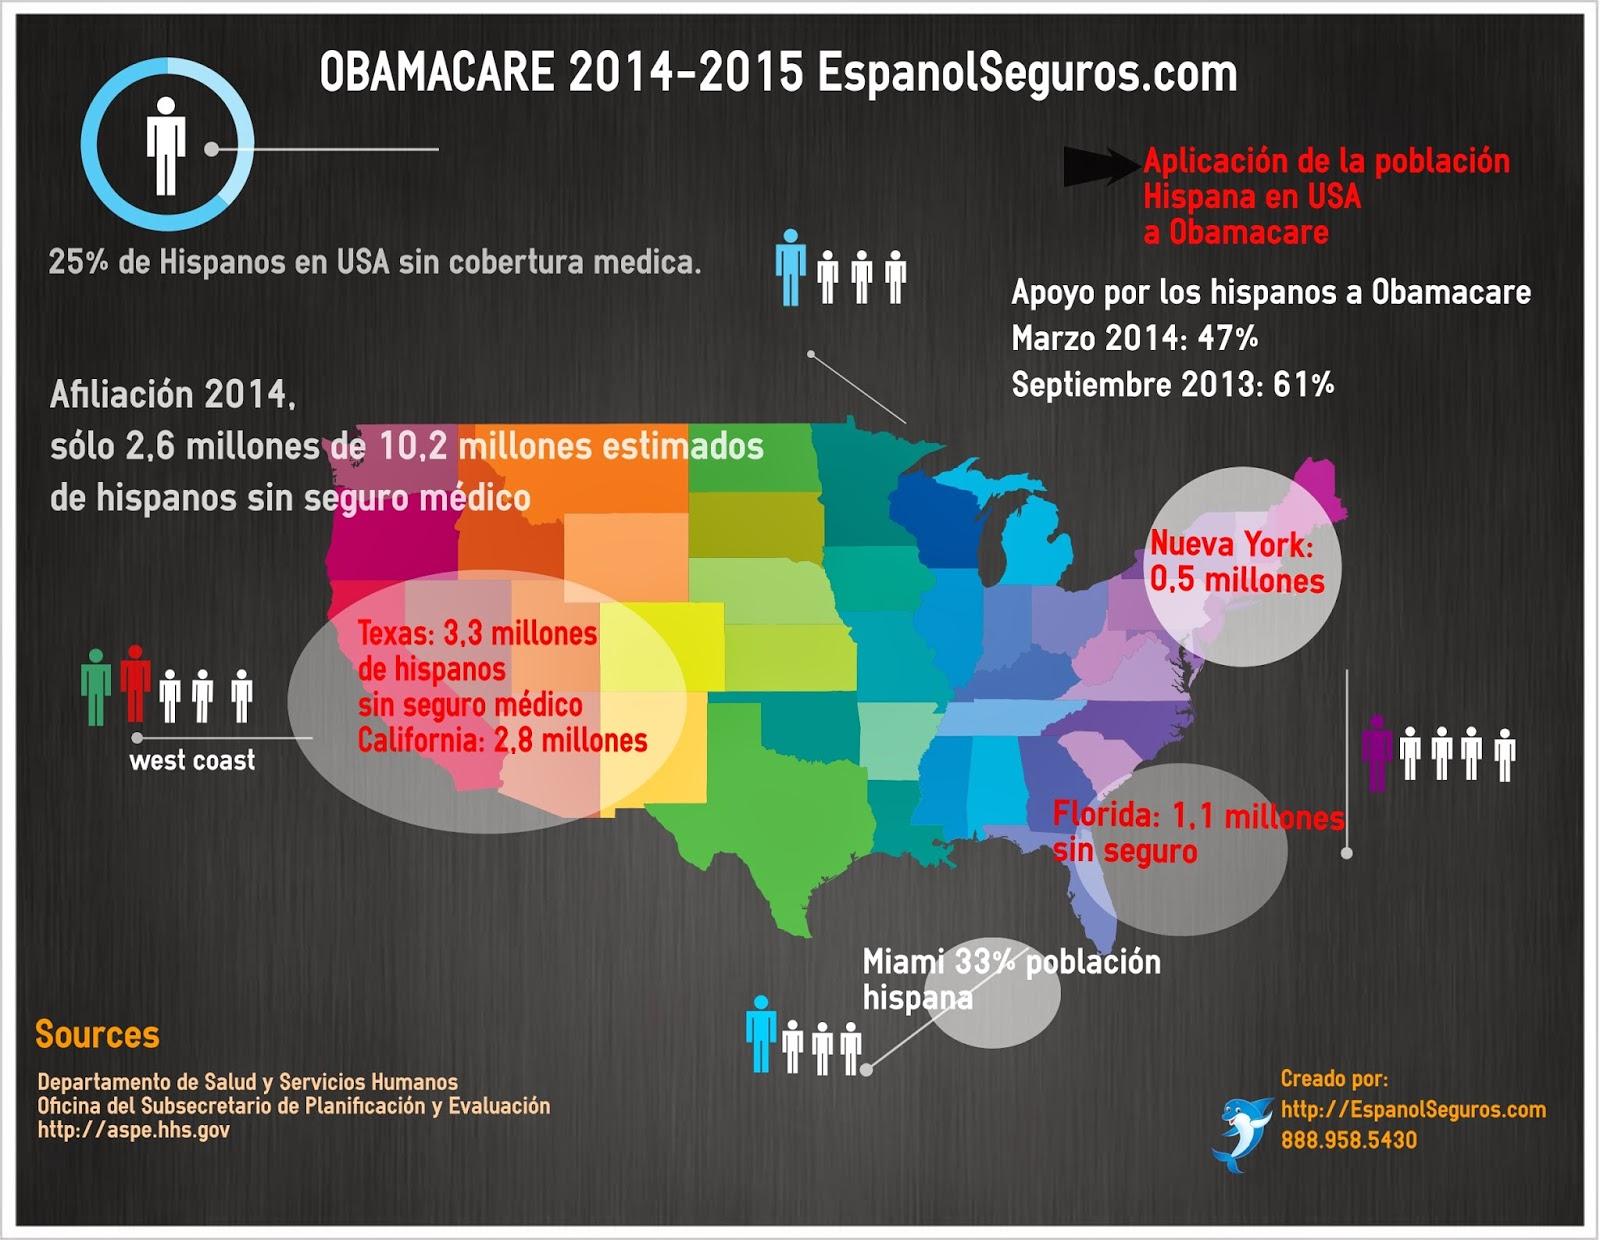 Conoce Toda la Informacion sobre Obamacare Houston Tx